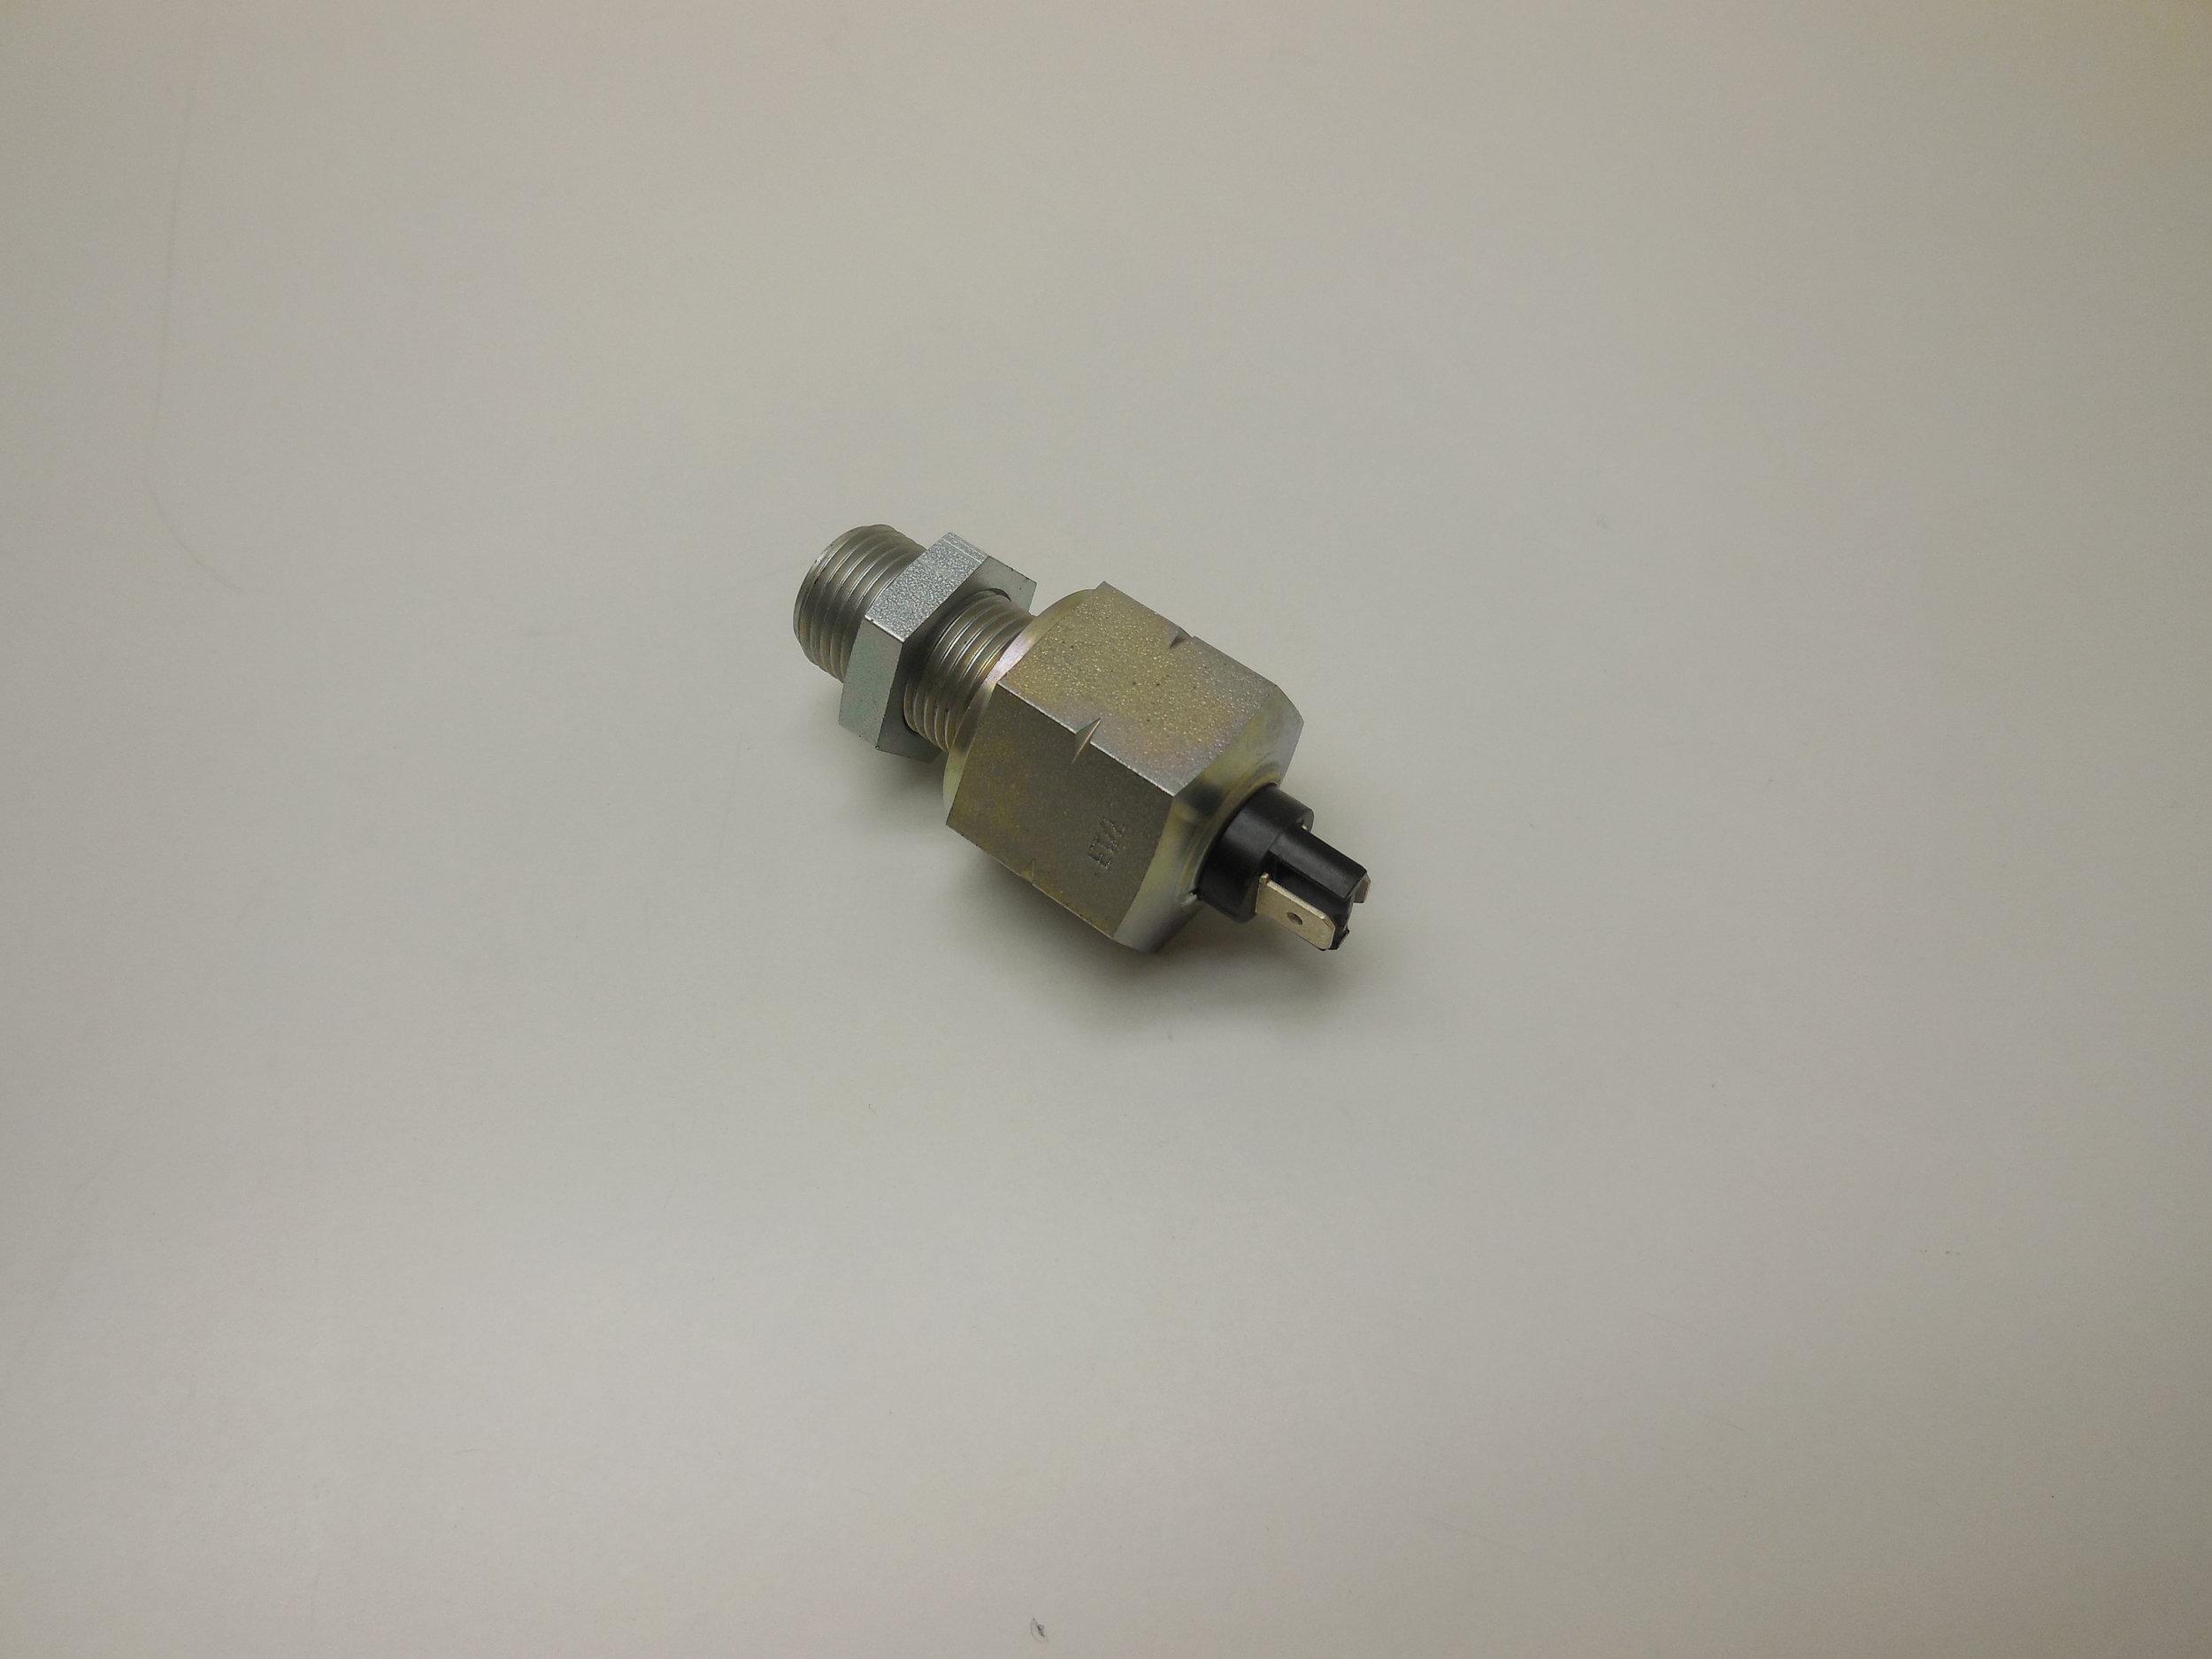 Electric Sensor Häggo NR: 5692 4634-008 NR: F6916-000291 Price: 1106 SEK